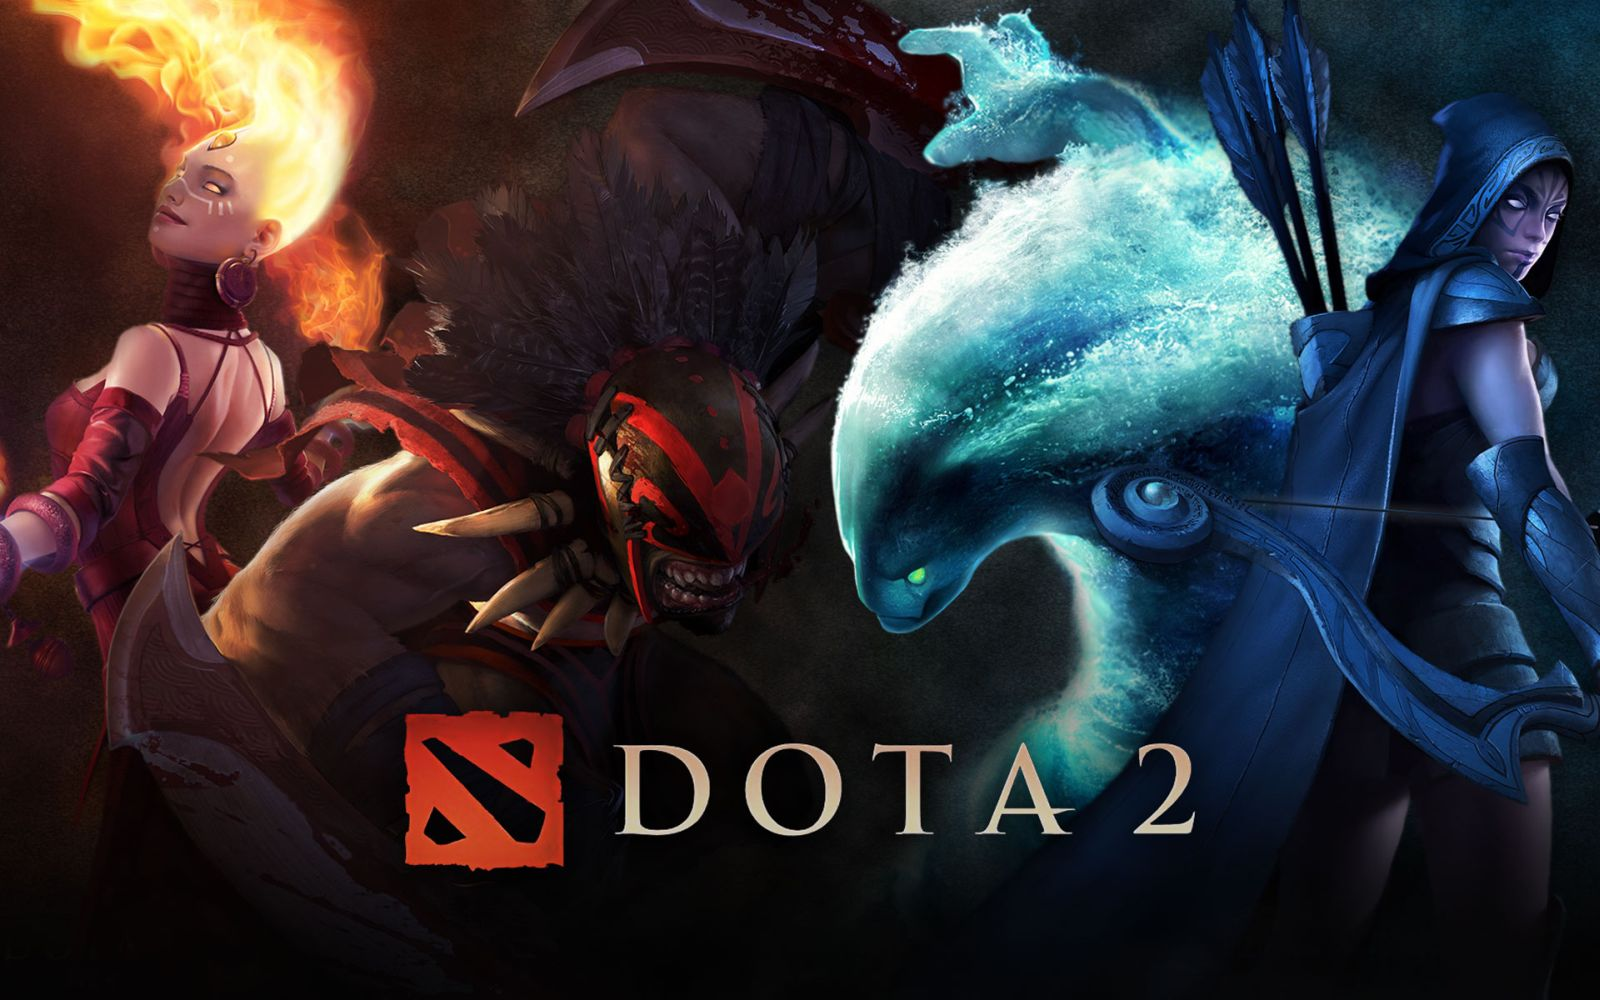 Dota-2-PC-Game-11 Team EG, Dota 2 The International 2015'i kazanan takım oldu